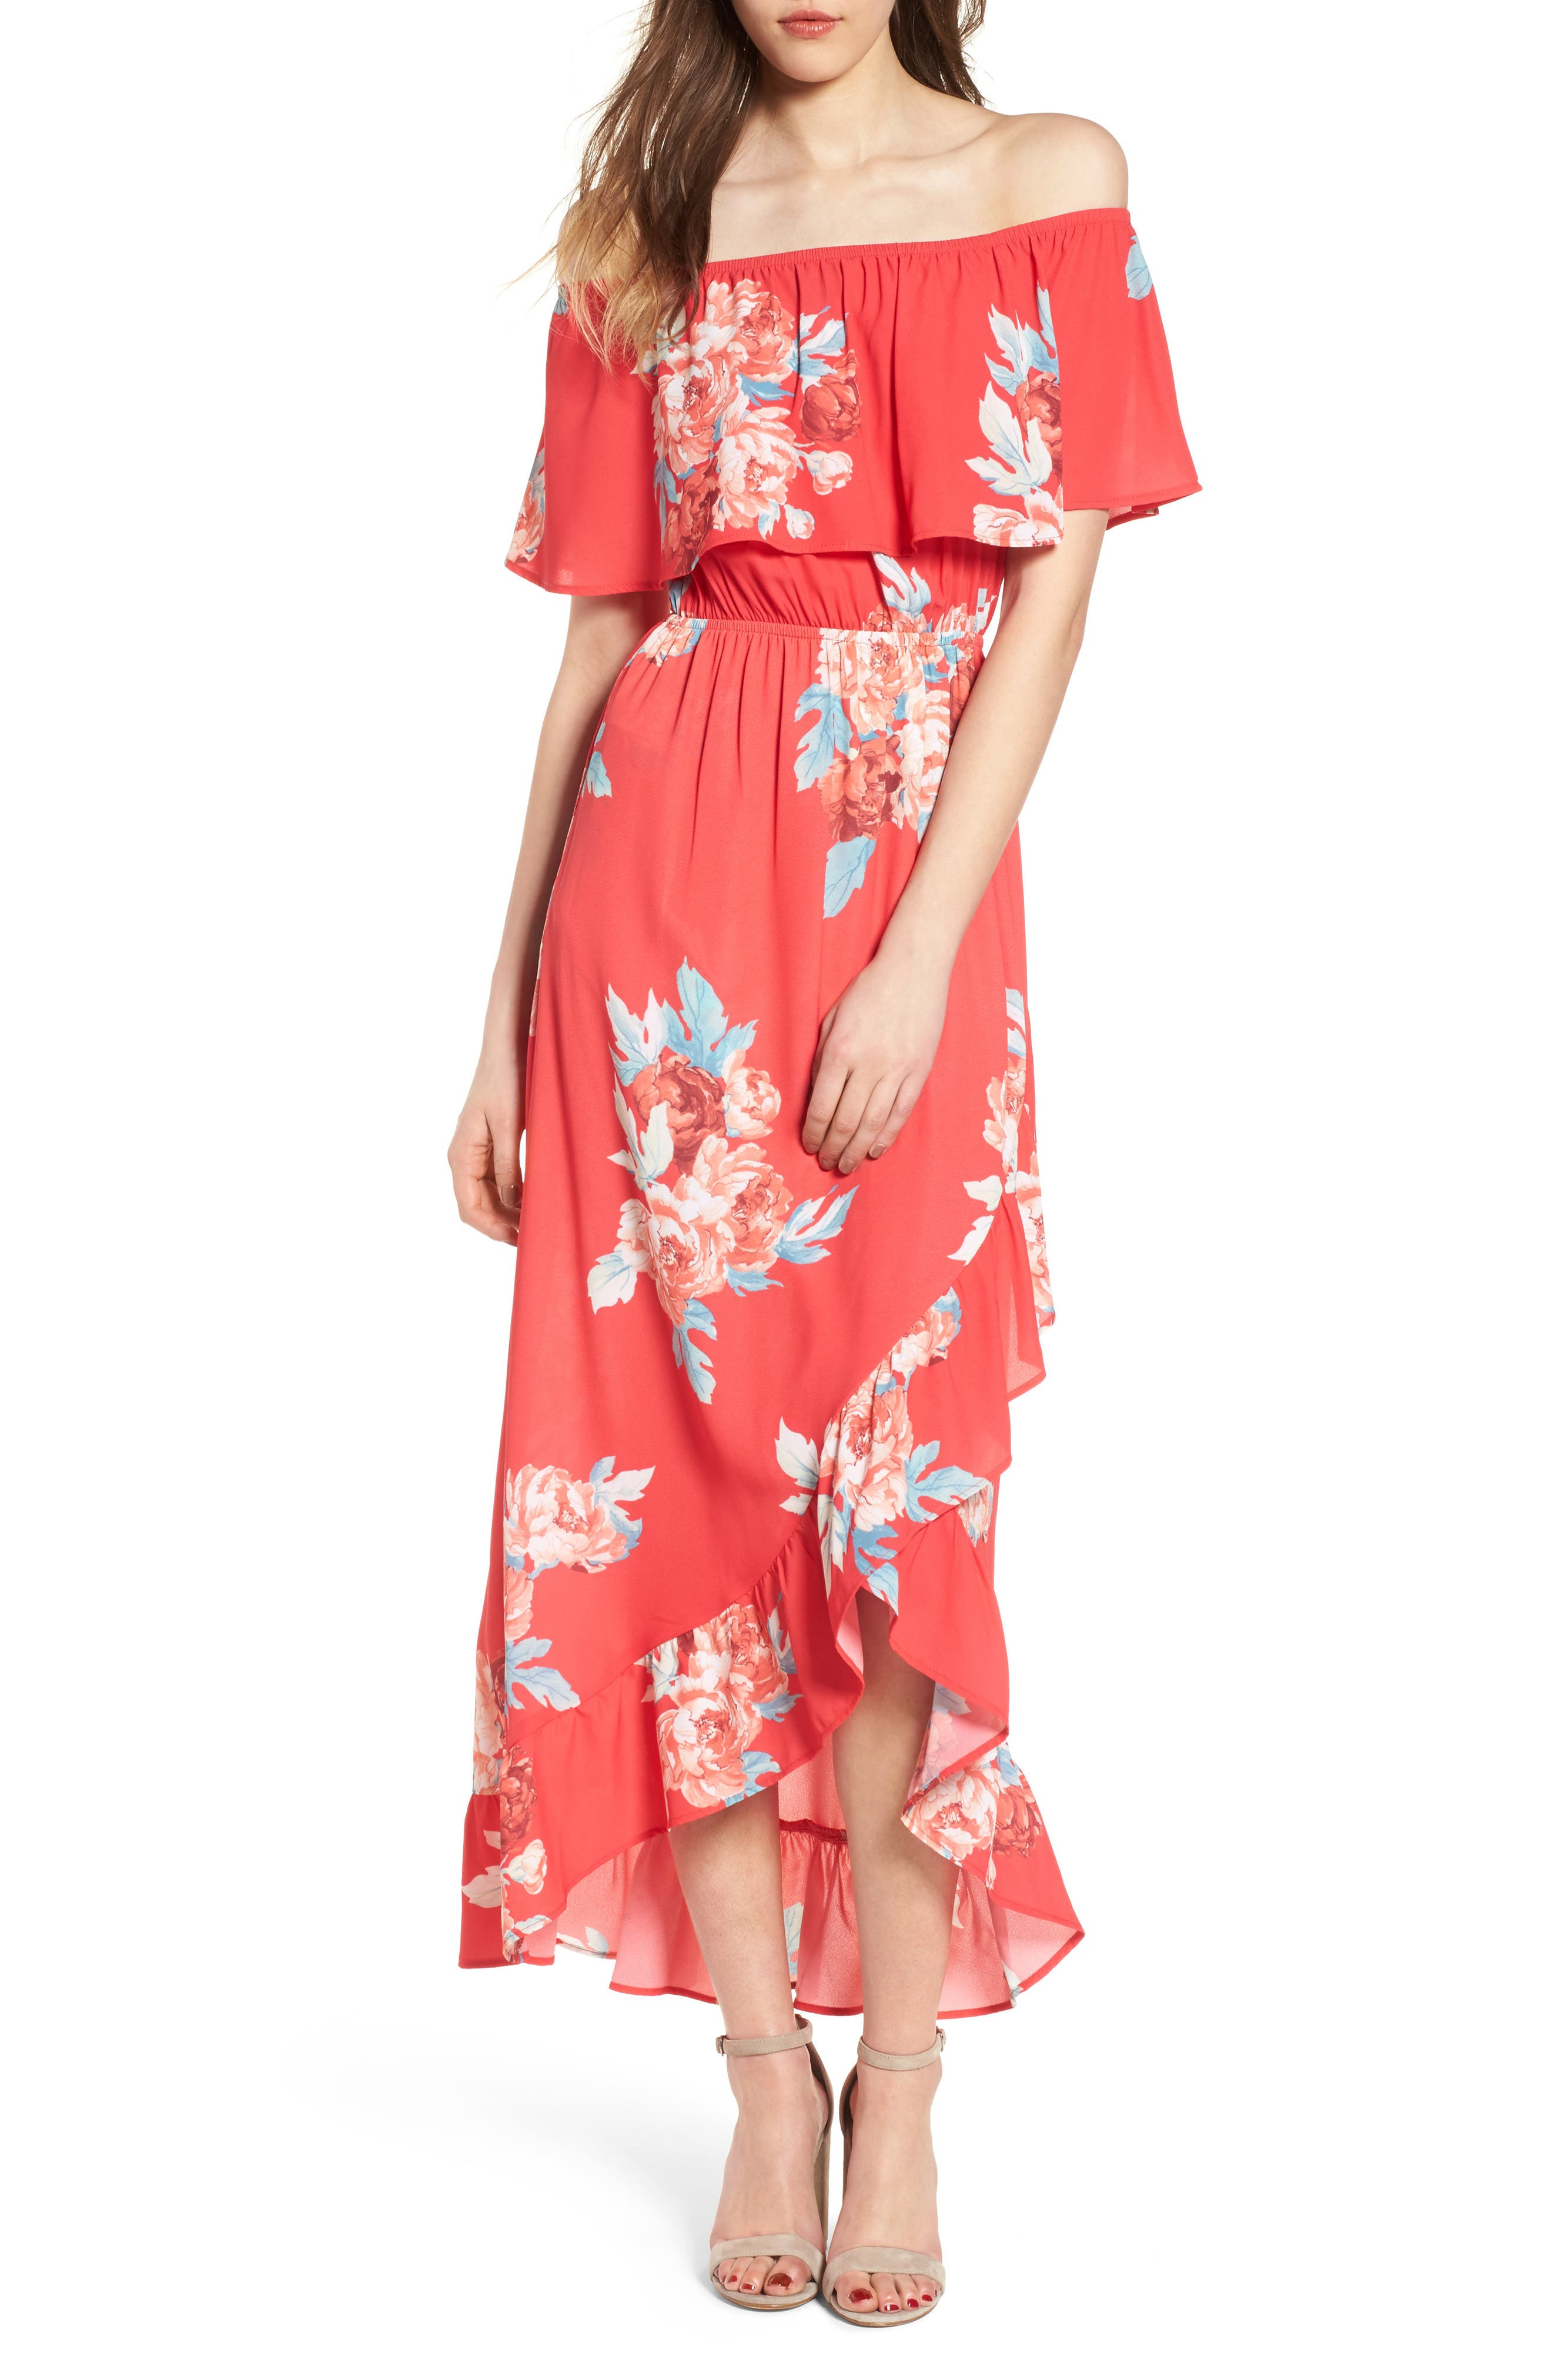 Mimi Chica Off The Shoulder Maxi Dress